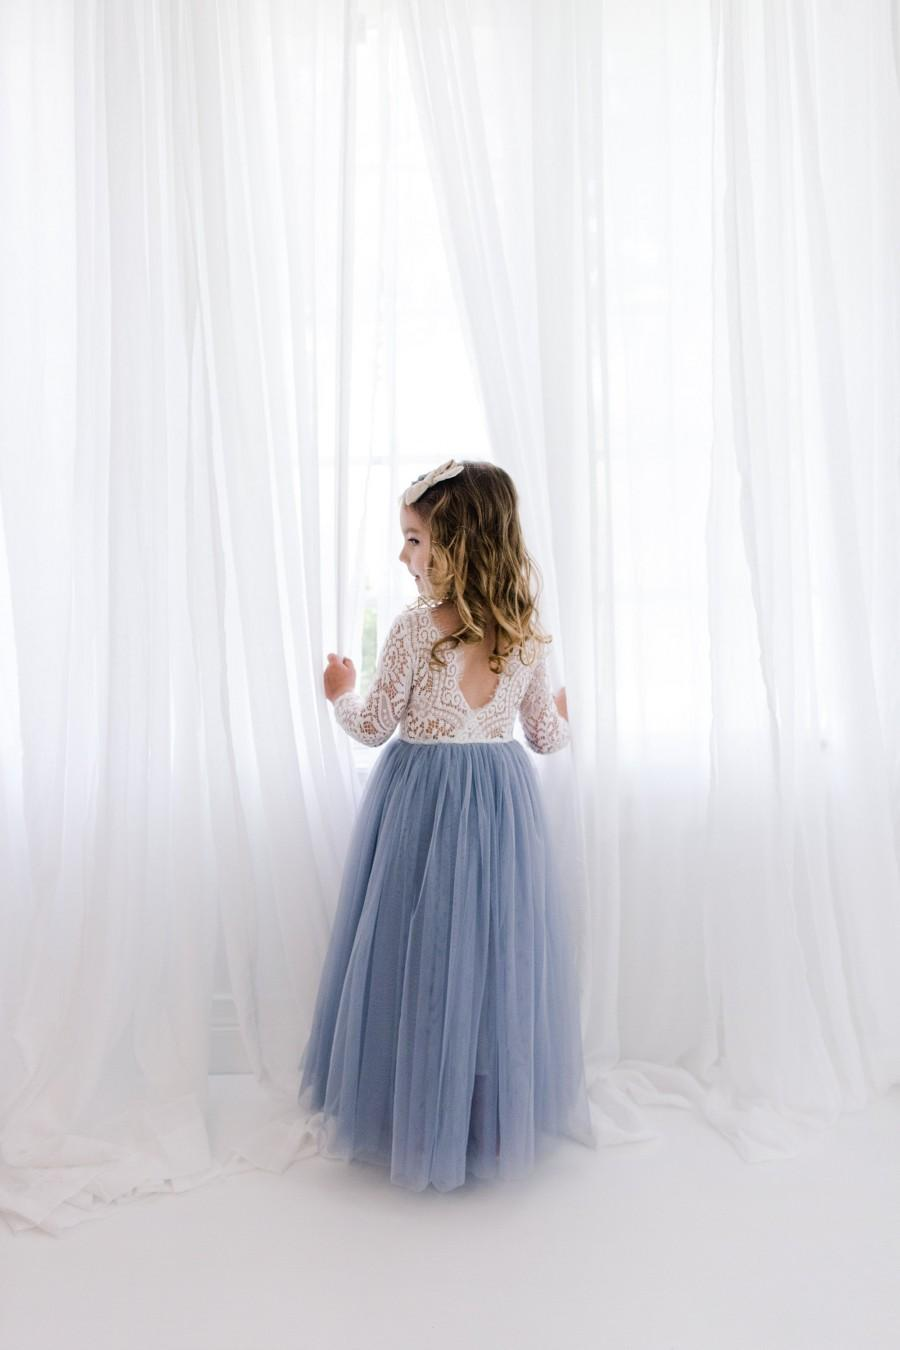 Wedding - Dusty Blue Gray Tulle Long Sleeve Wedding dress, White Lace Flower Girl Dress, Smoke Blue Floor Length Ball Gown